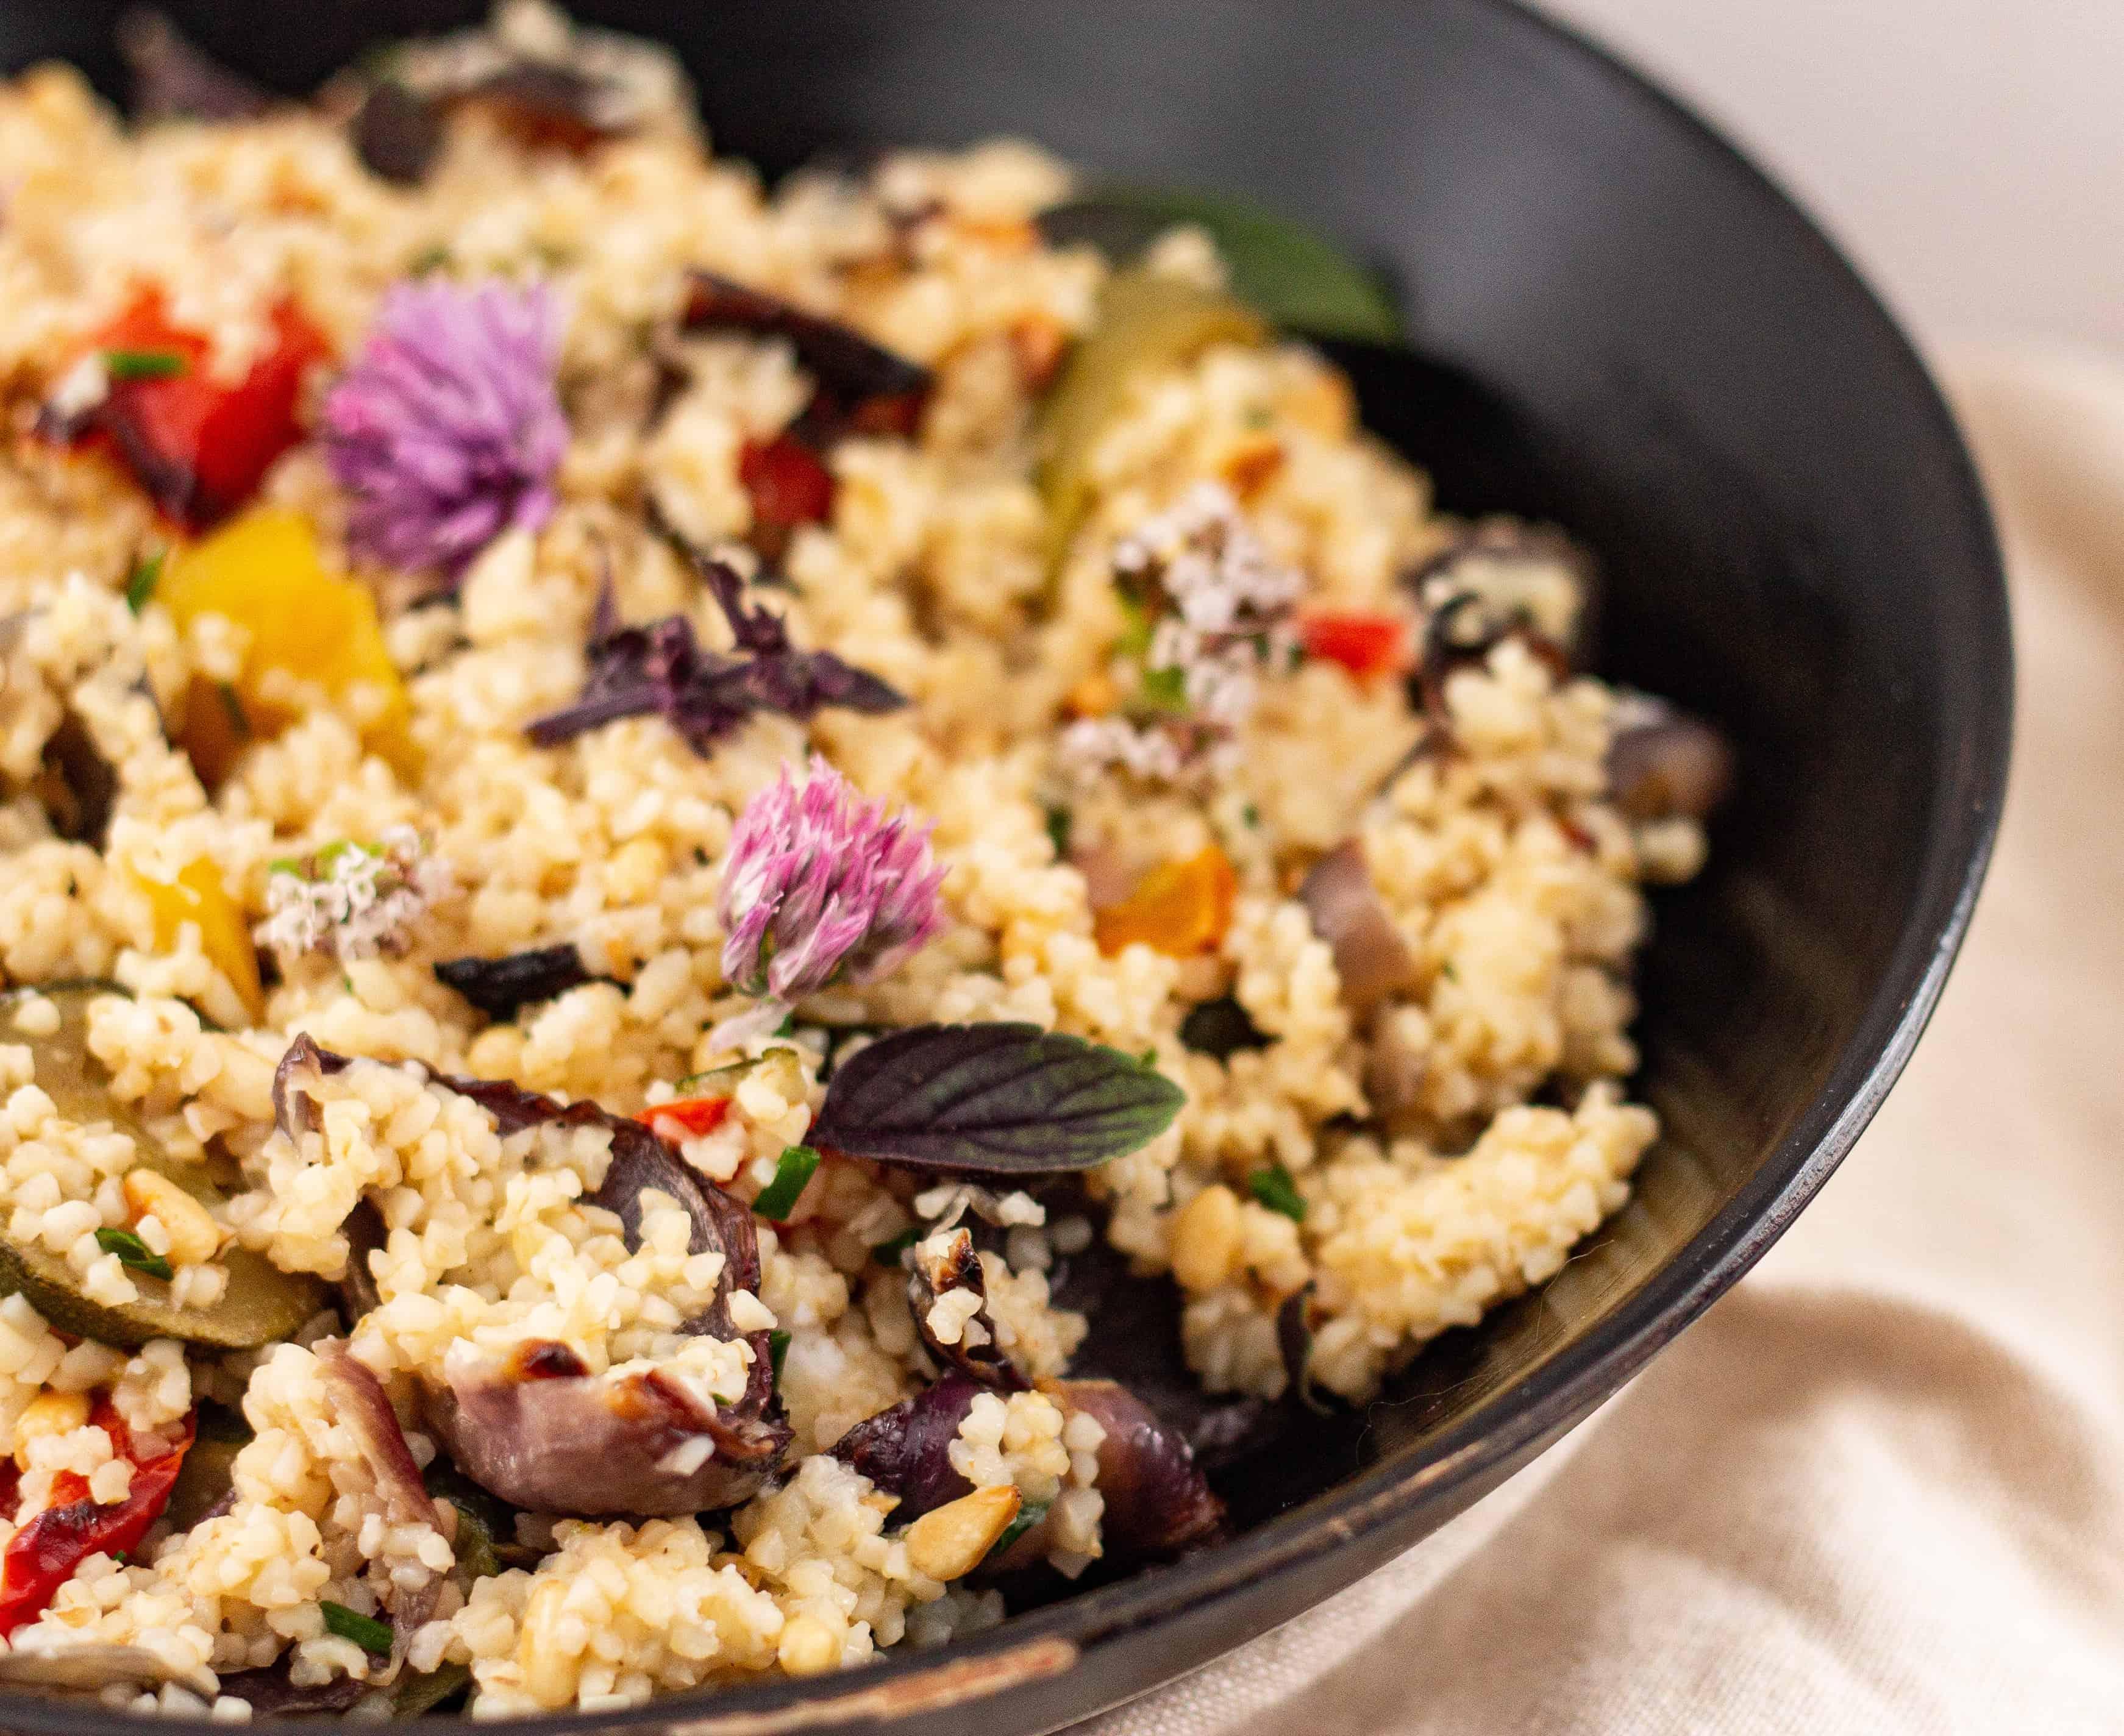 Easy Vegan Bulgur Wheat and Roast Vegetable Recipe